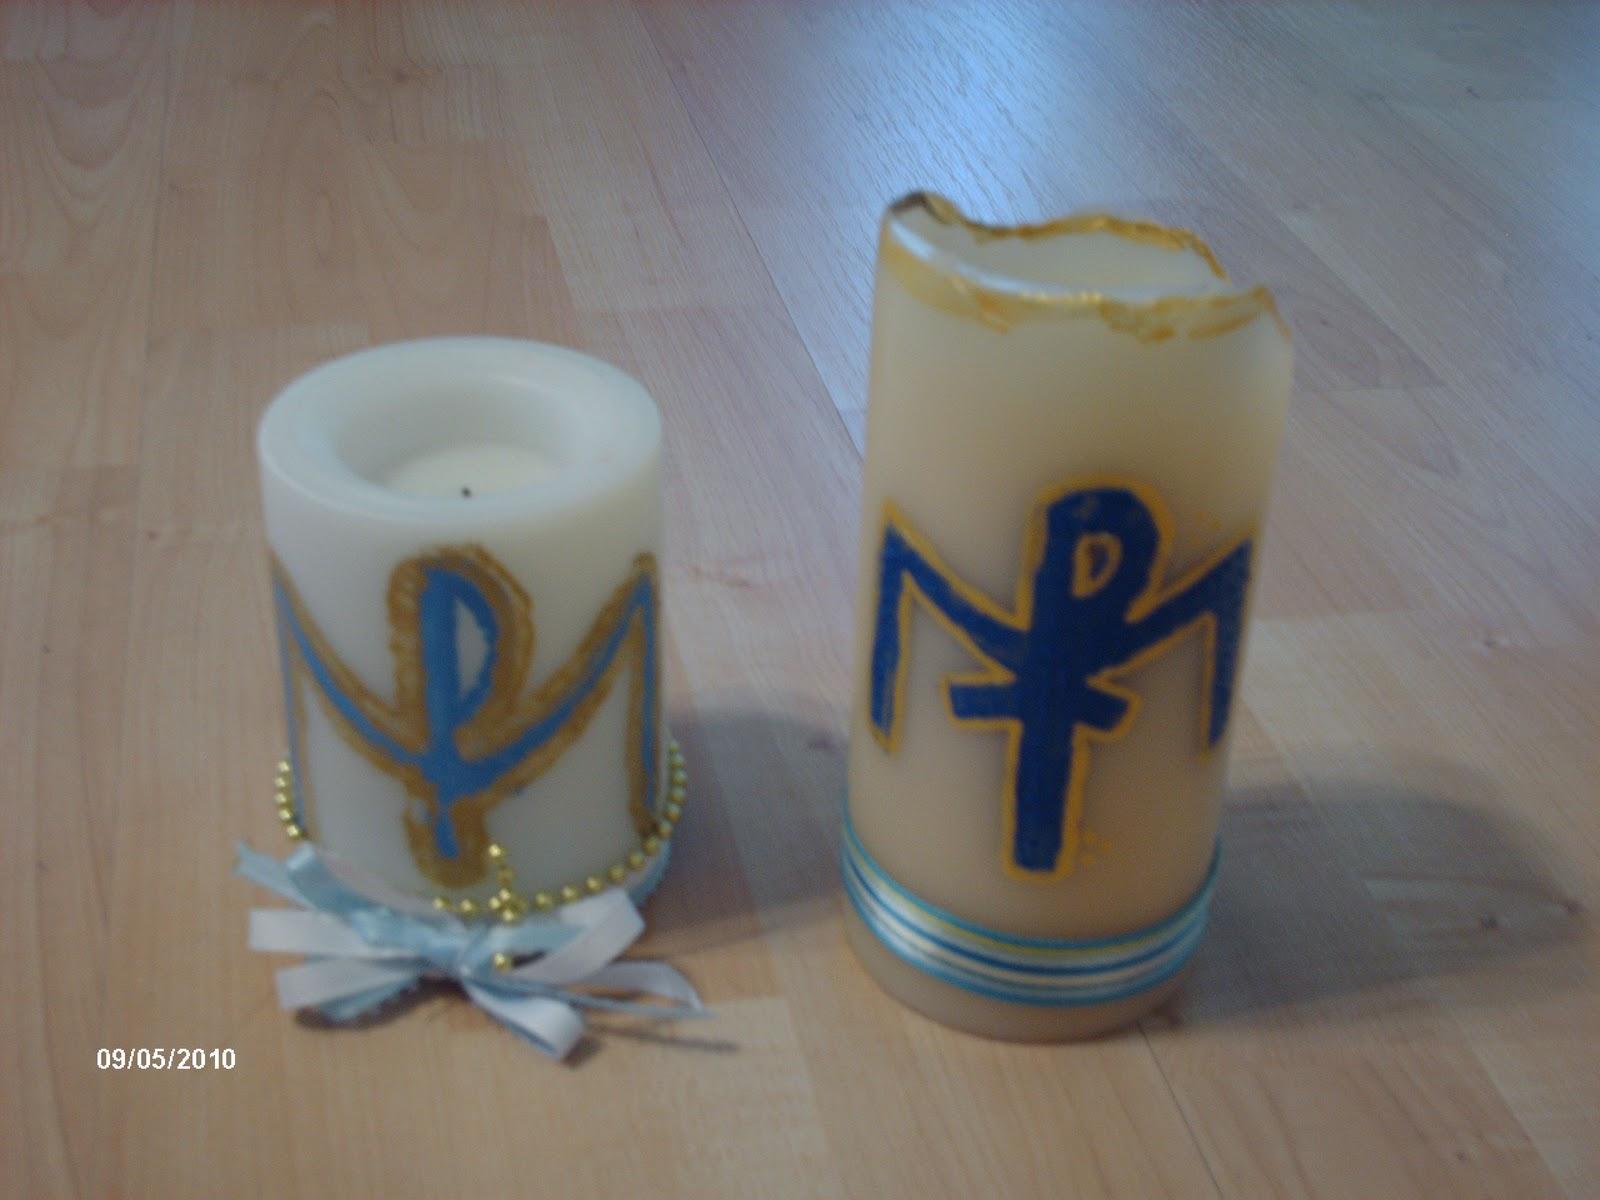 Familia Cat lica Decora un cirio o vela con s mbolos Marianos